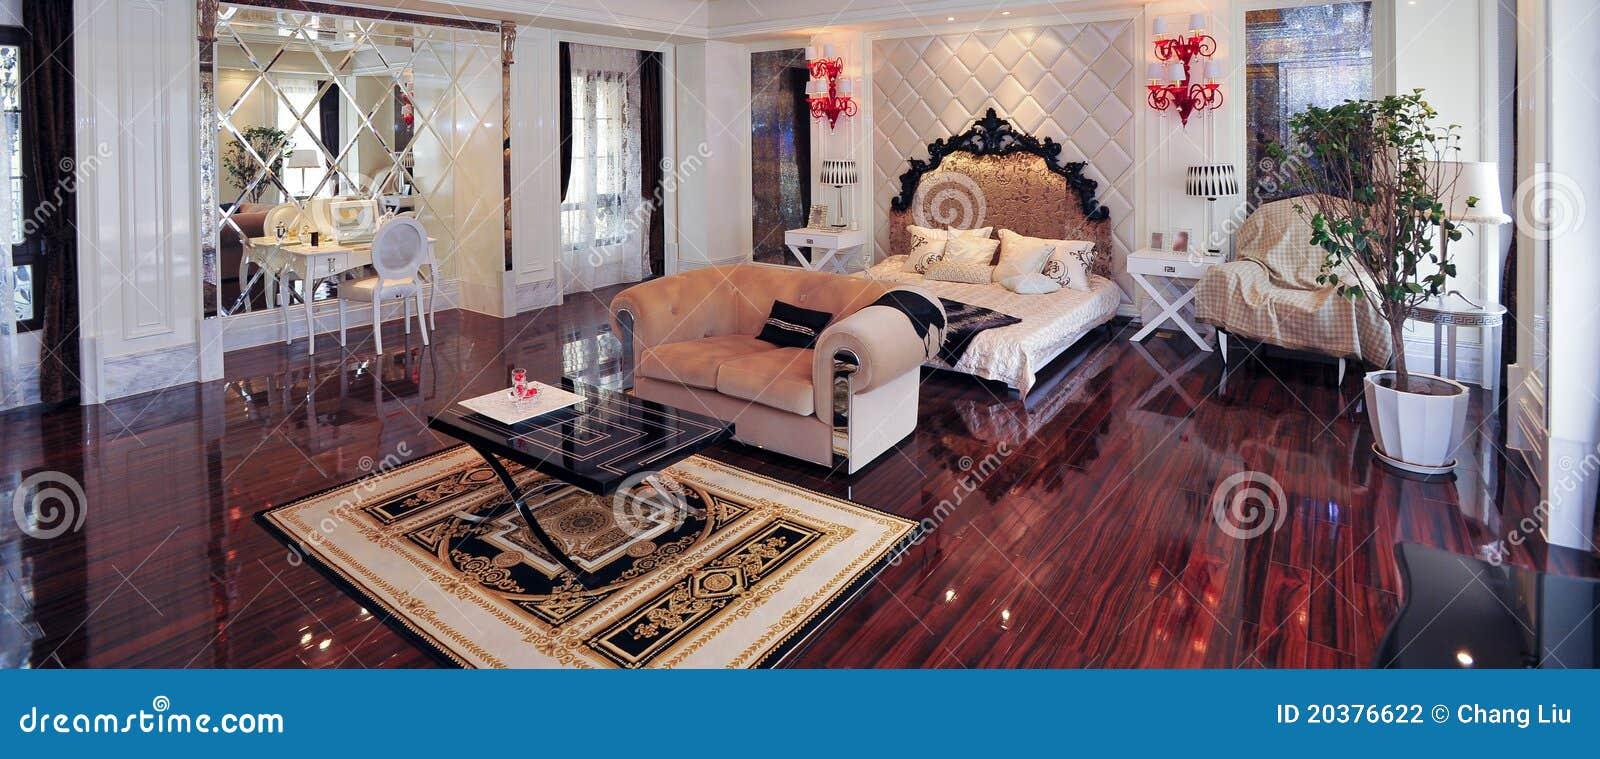 Chambre coucher royale europ enne photographie stock for Chambre a coucher royale